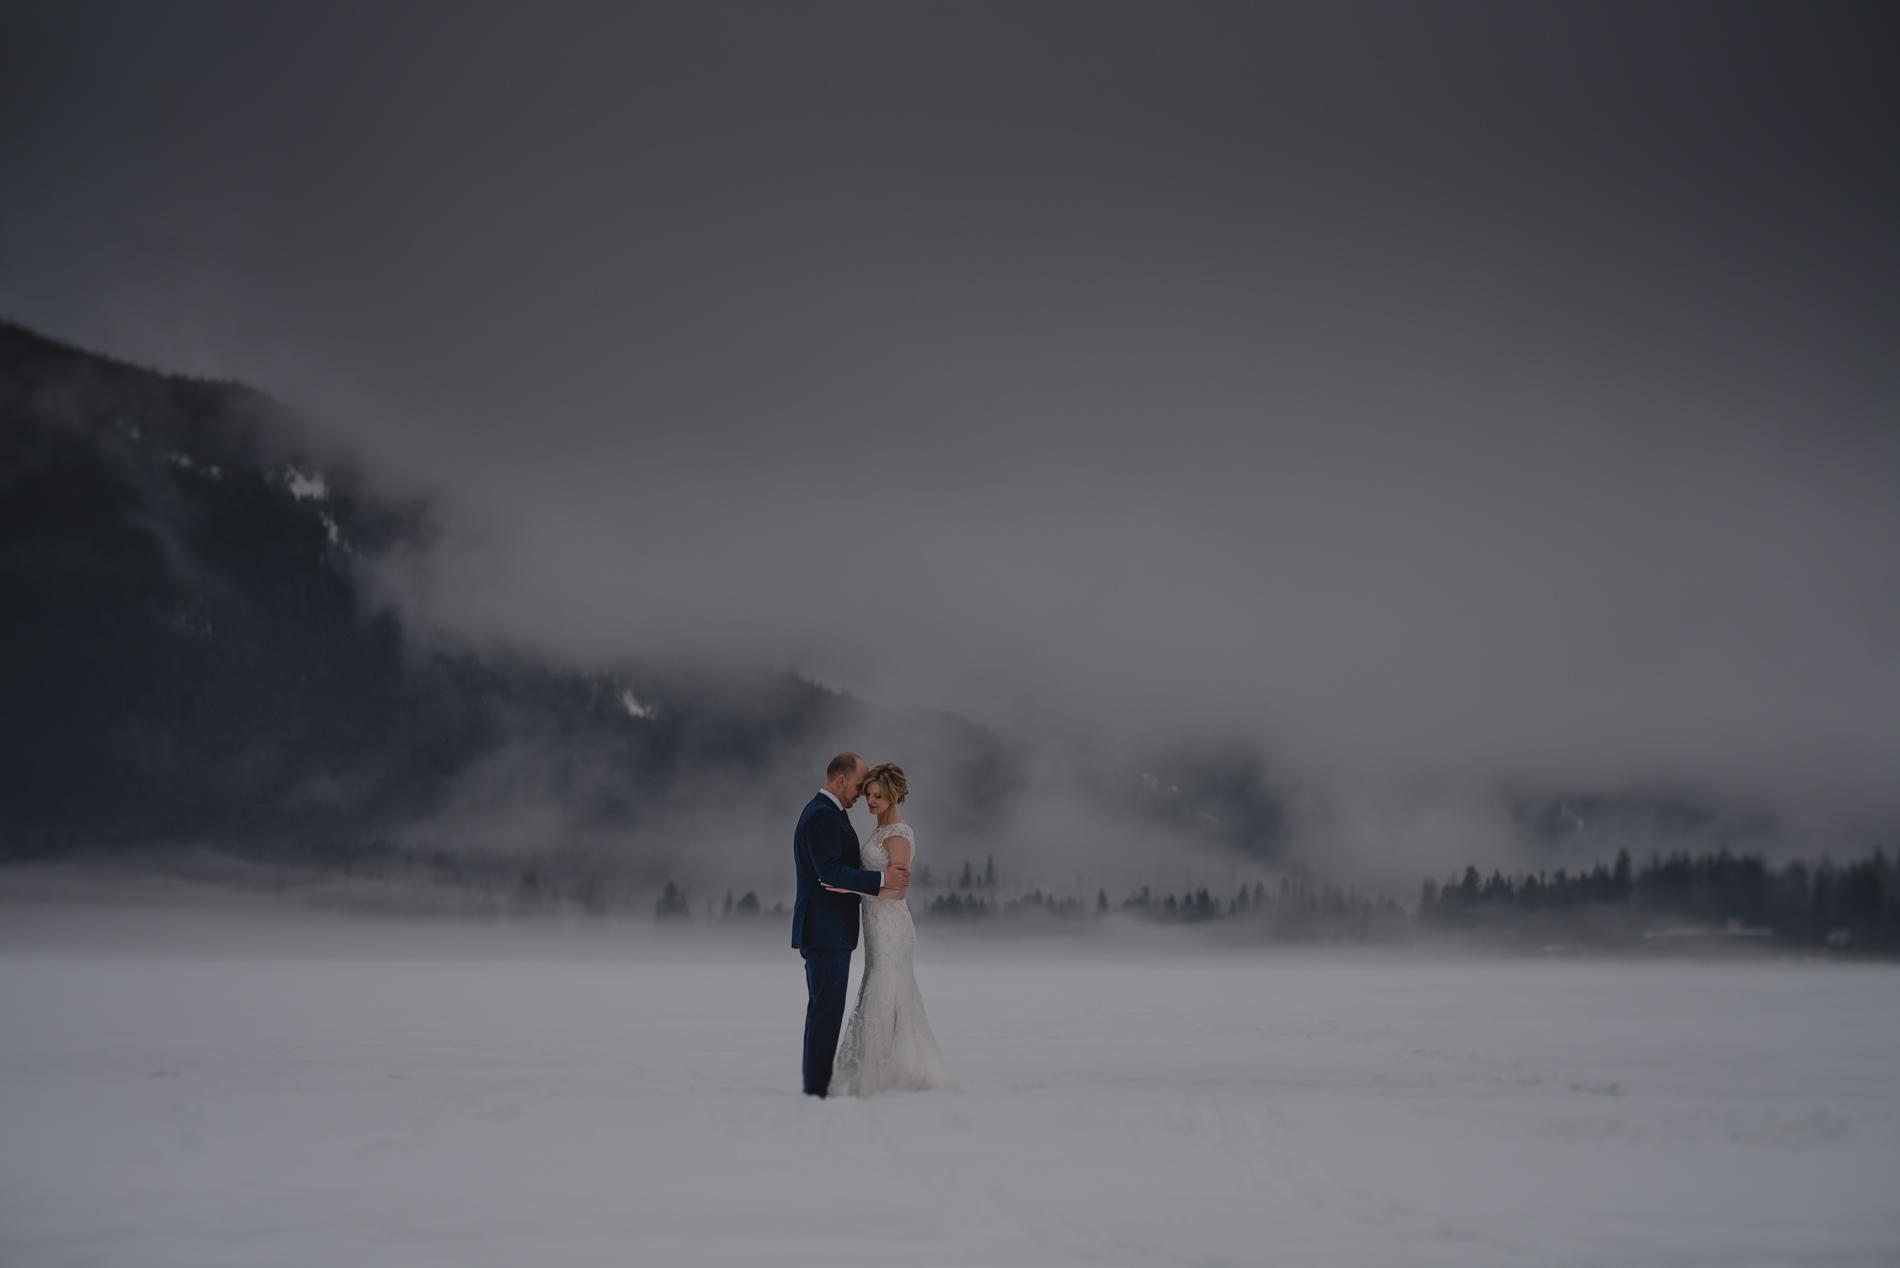 Wedding couple holding on a foggy frozen lake